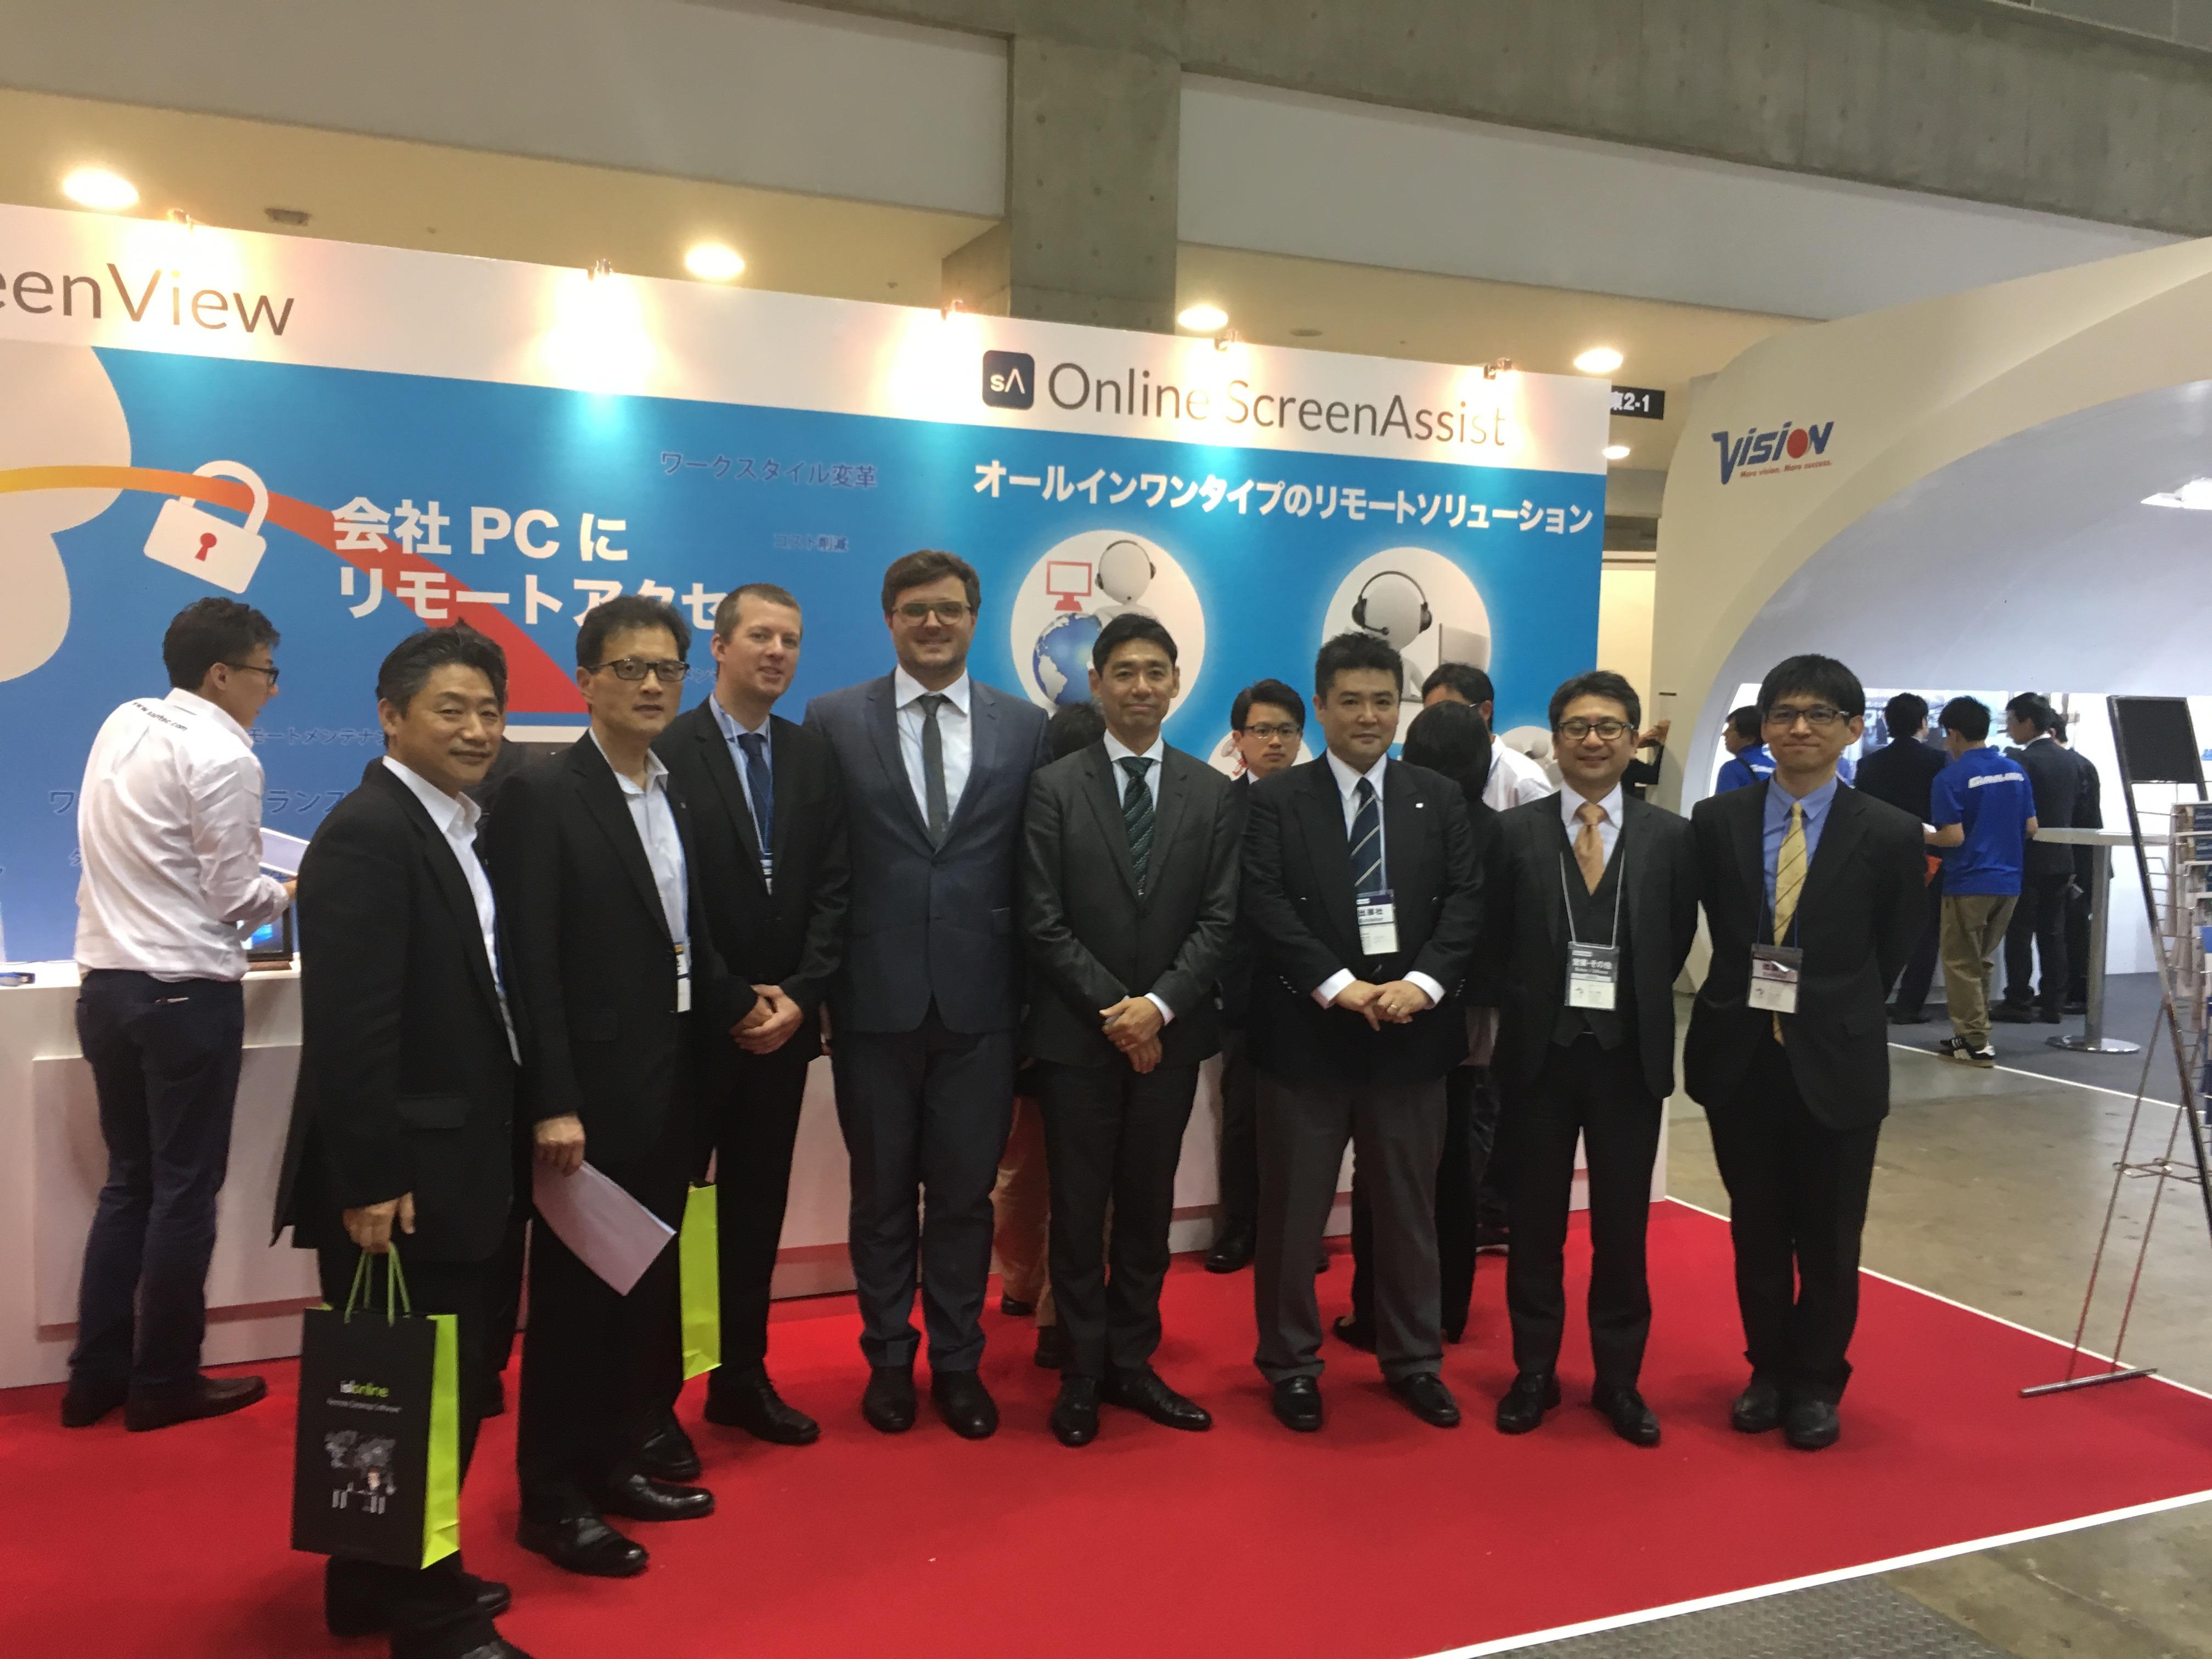 Ekipa Santec - OceanBridge - XLAB na sejmu Japan IT Week.